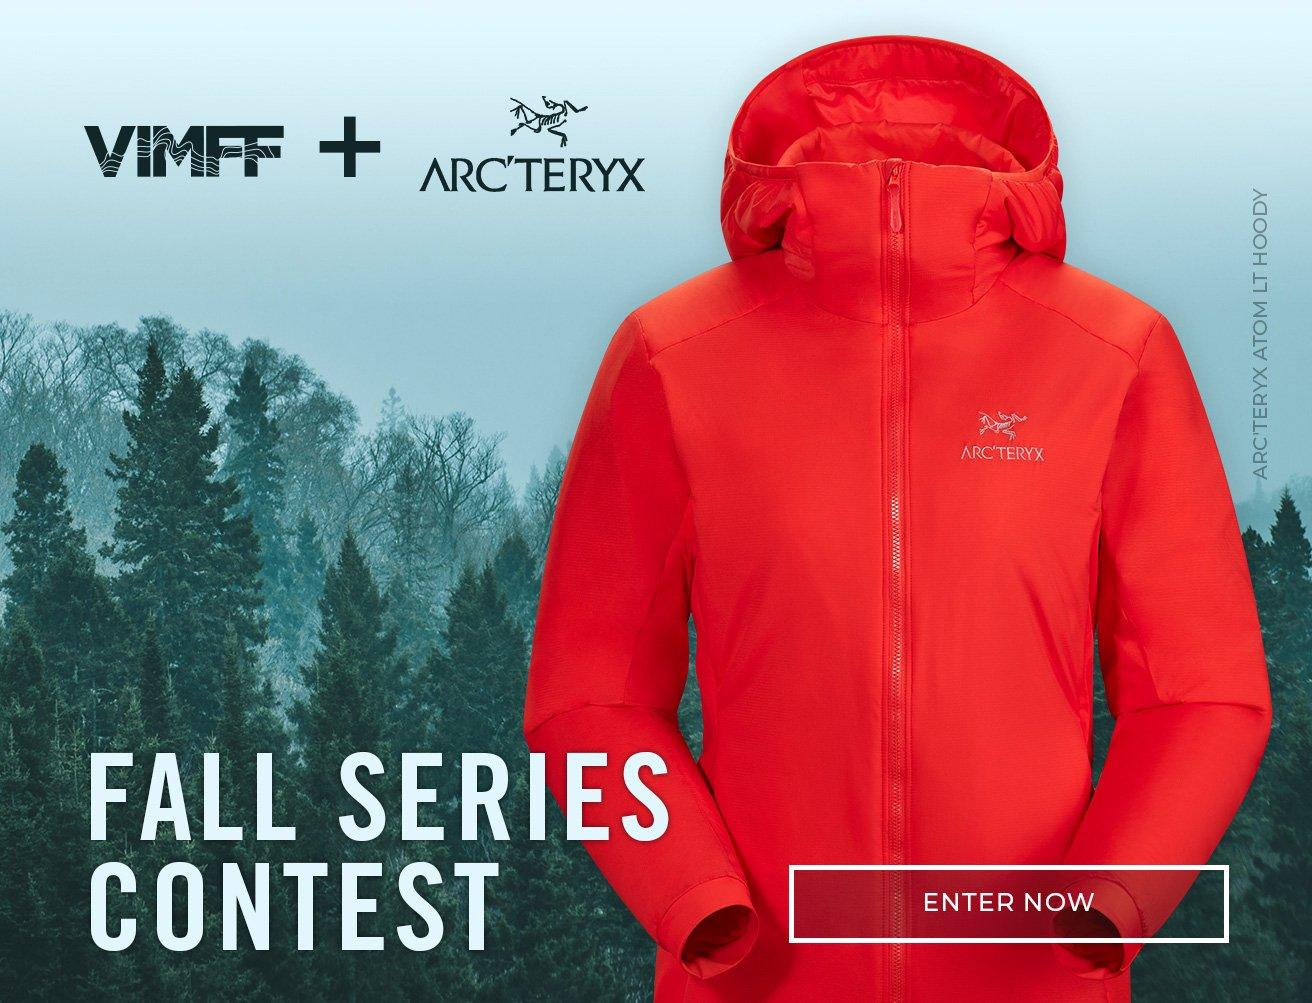 vimff fall series arcteryx contest cta